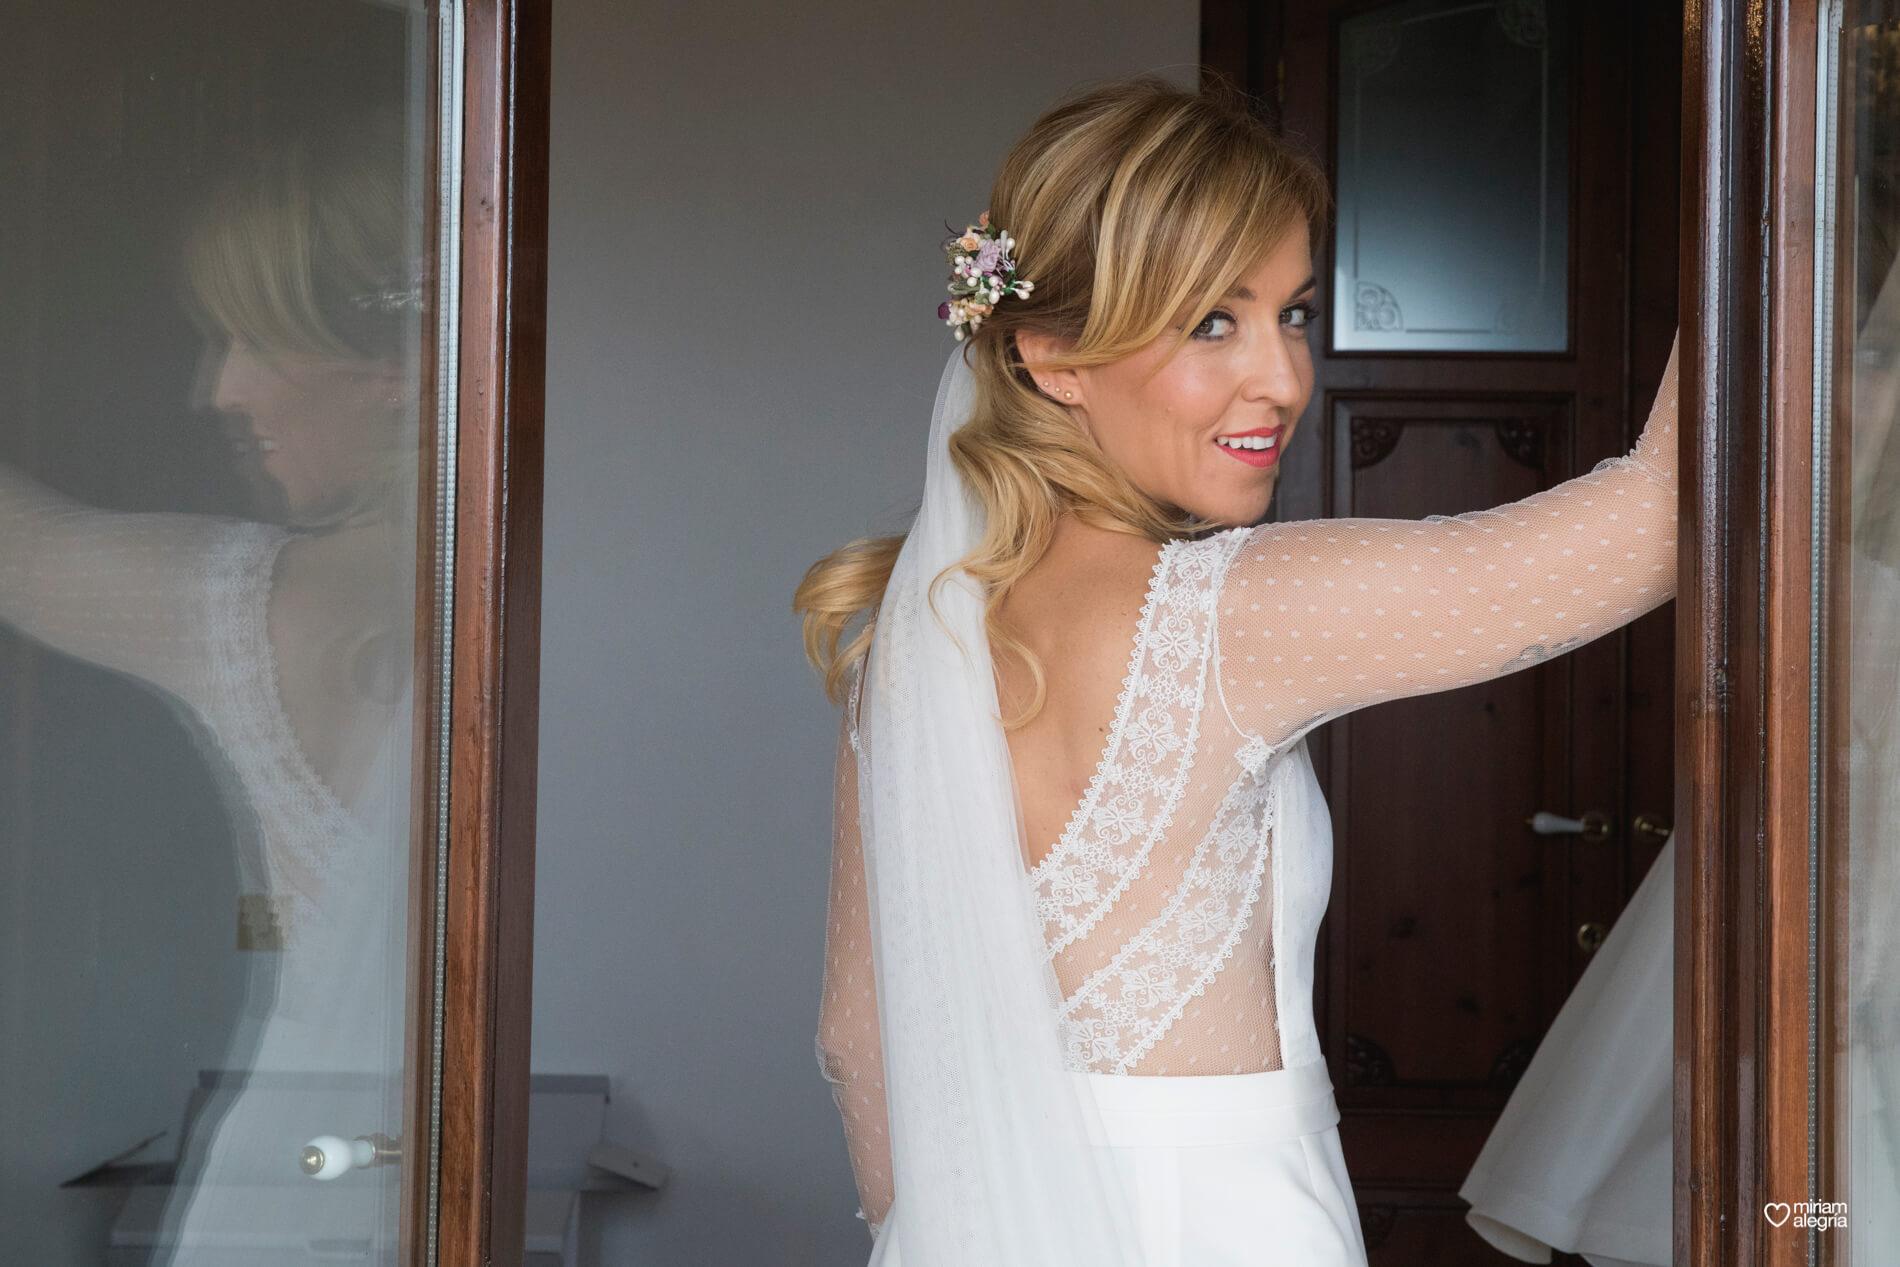 la-boda-de-alemc7-miriam-alegria-fotografos-boda-murcia-28